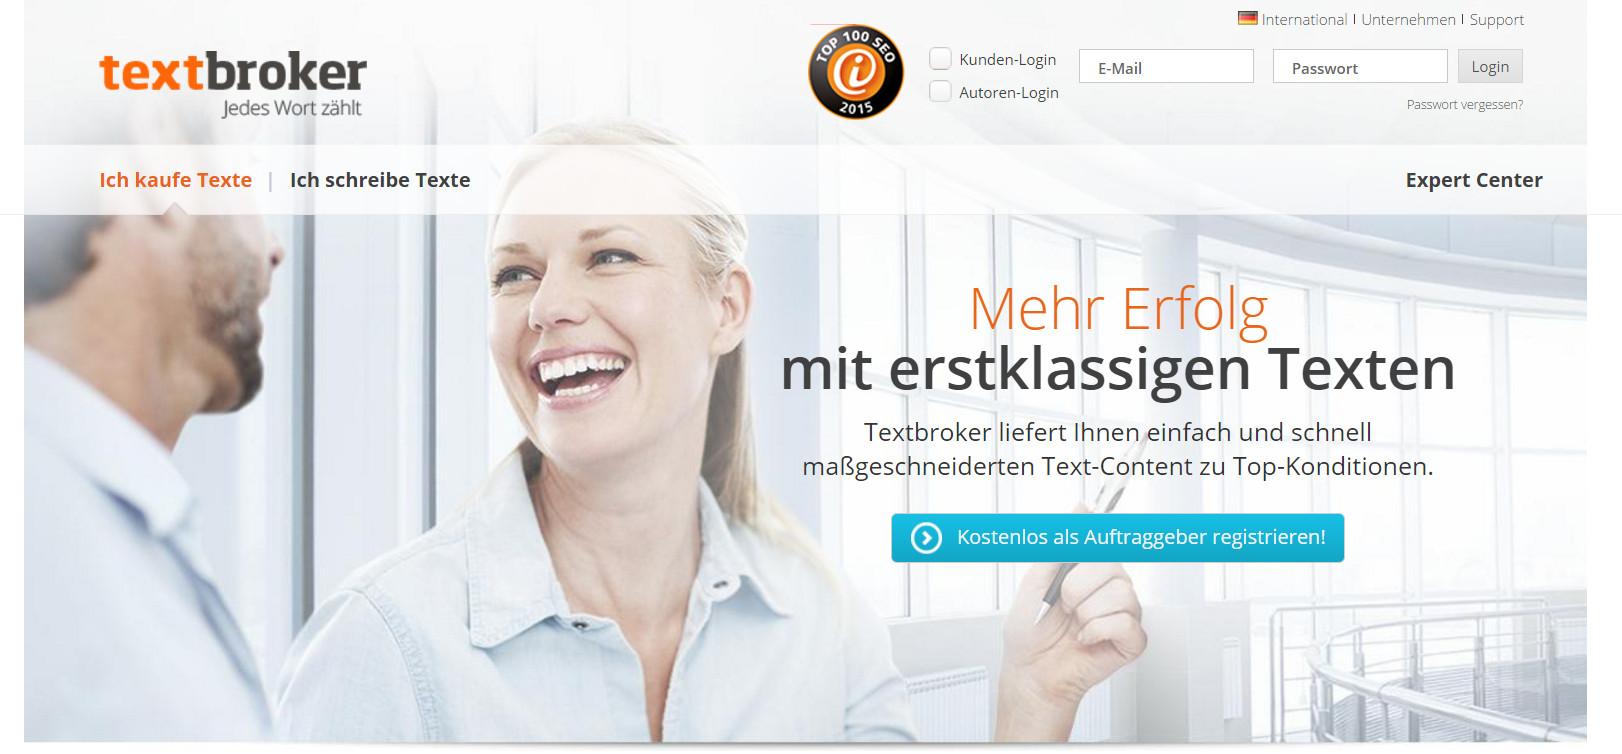 Textbroker.de Webseite